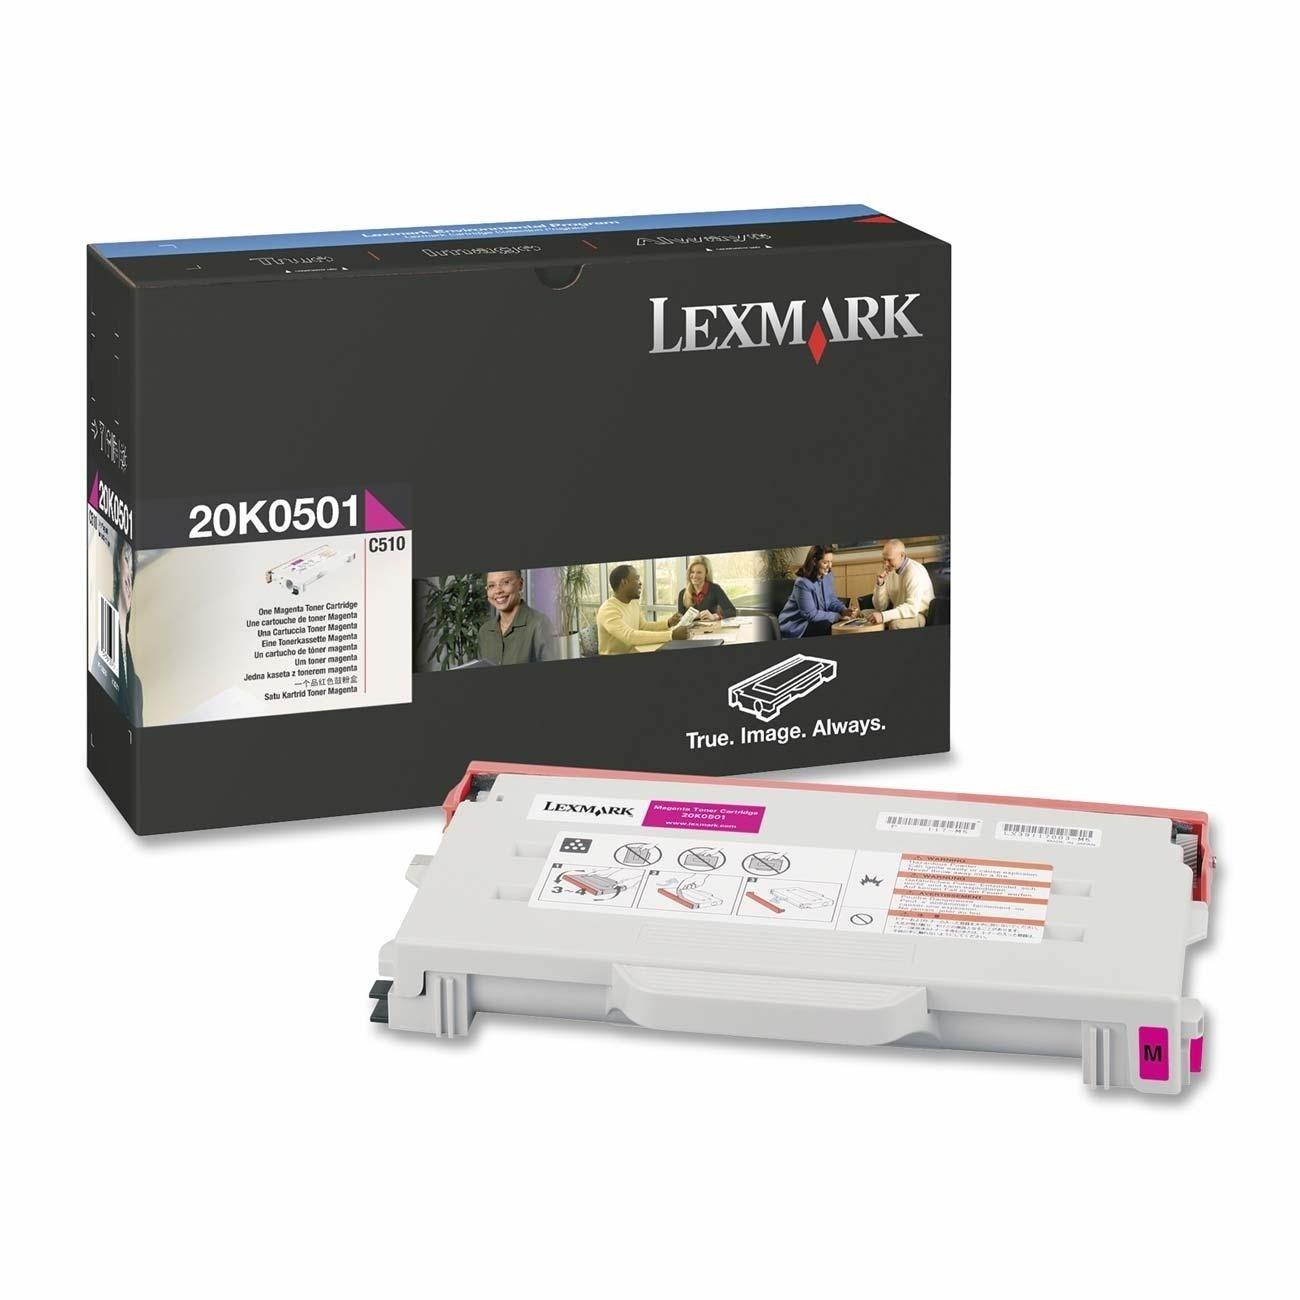 Lexmark 20K0501 Original Toner Cartridge - Magenta